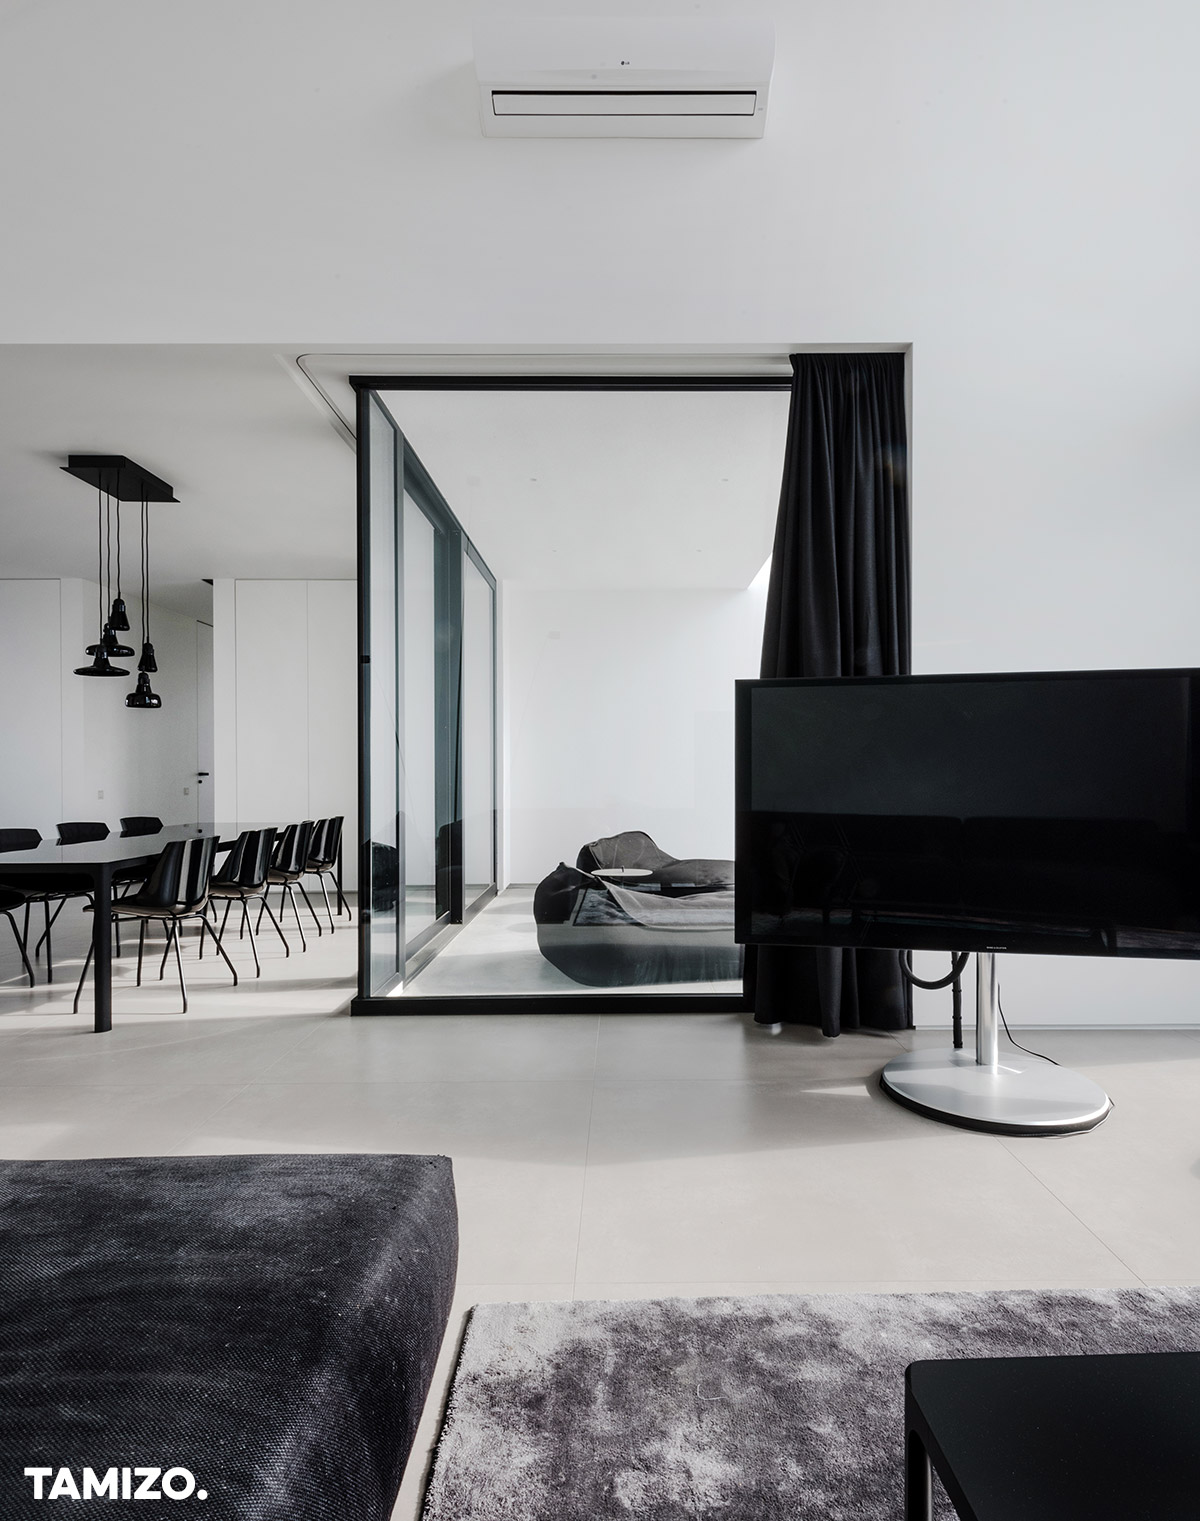 011_tamizo_architects_interior_house_realization_warsaw_poland_24